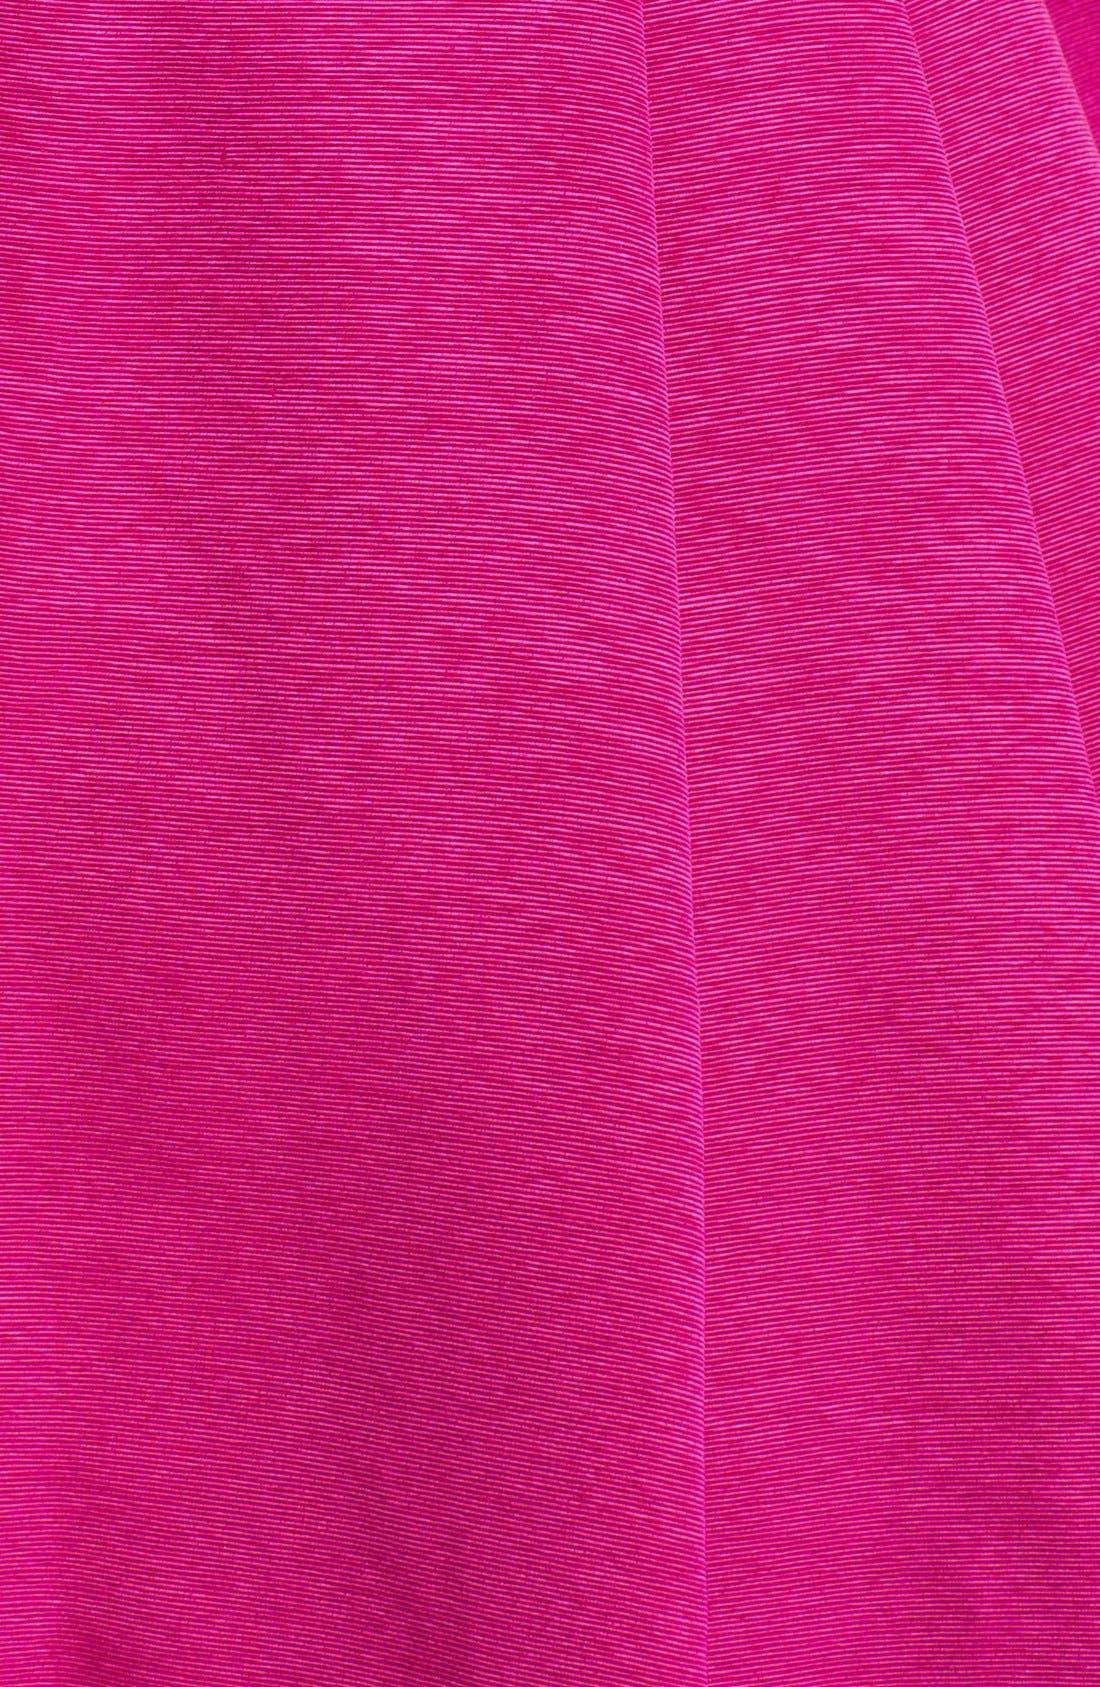 Alternate Image 3  - Eliza J Mixed Media Fit & Flare Dress